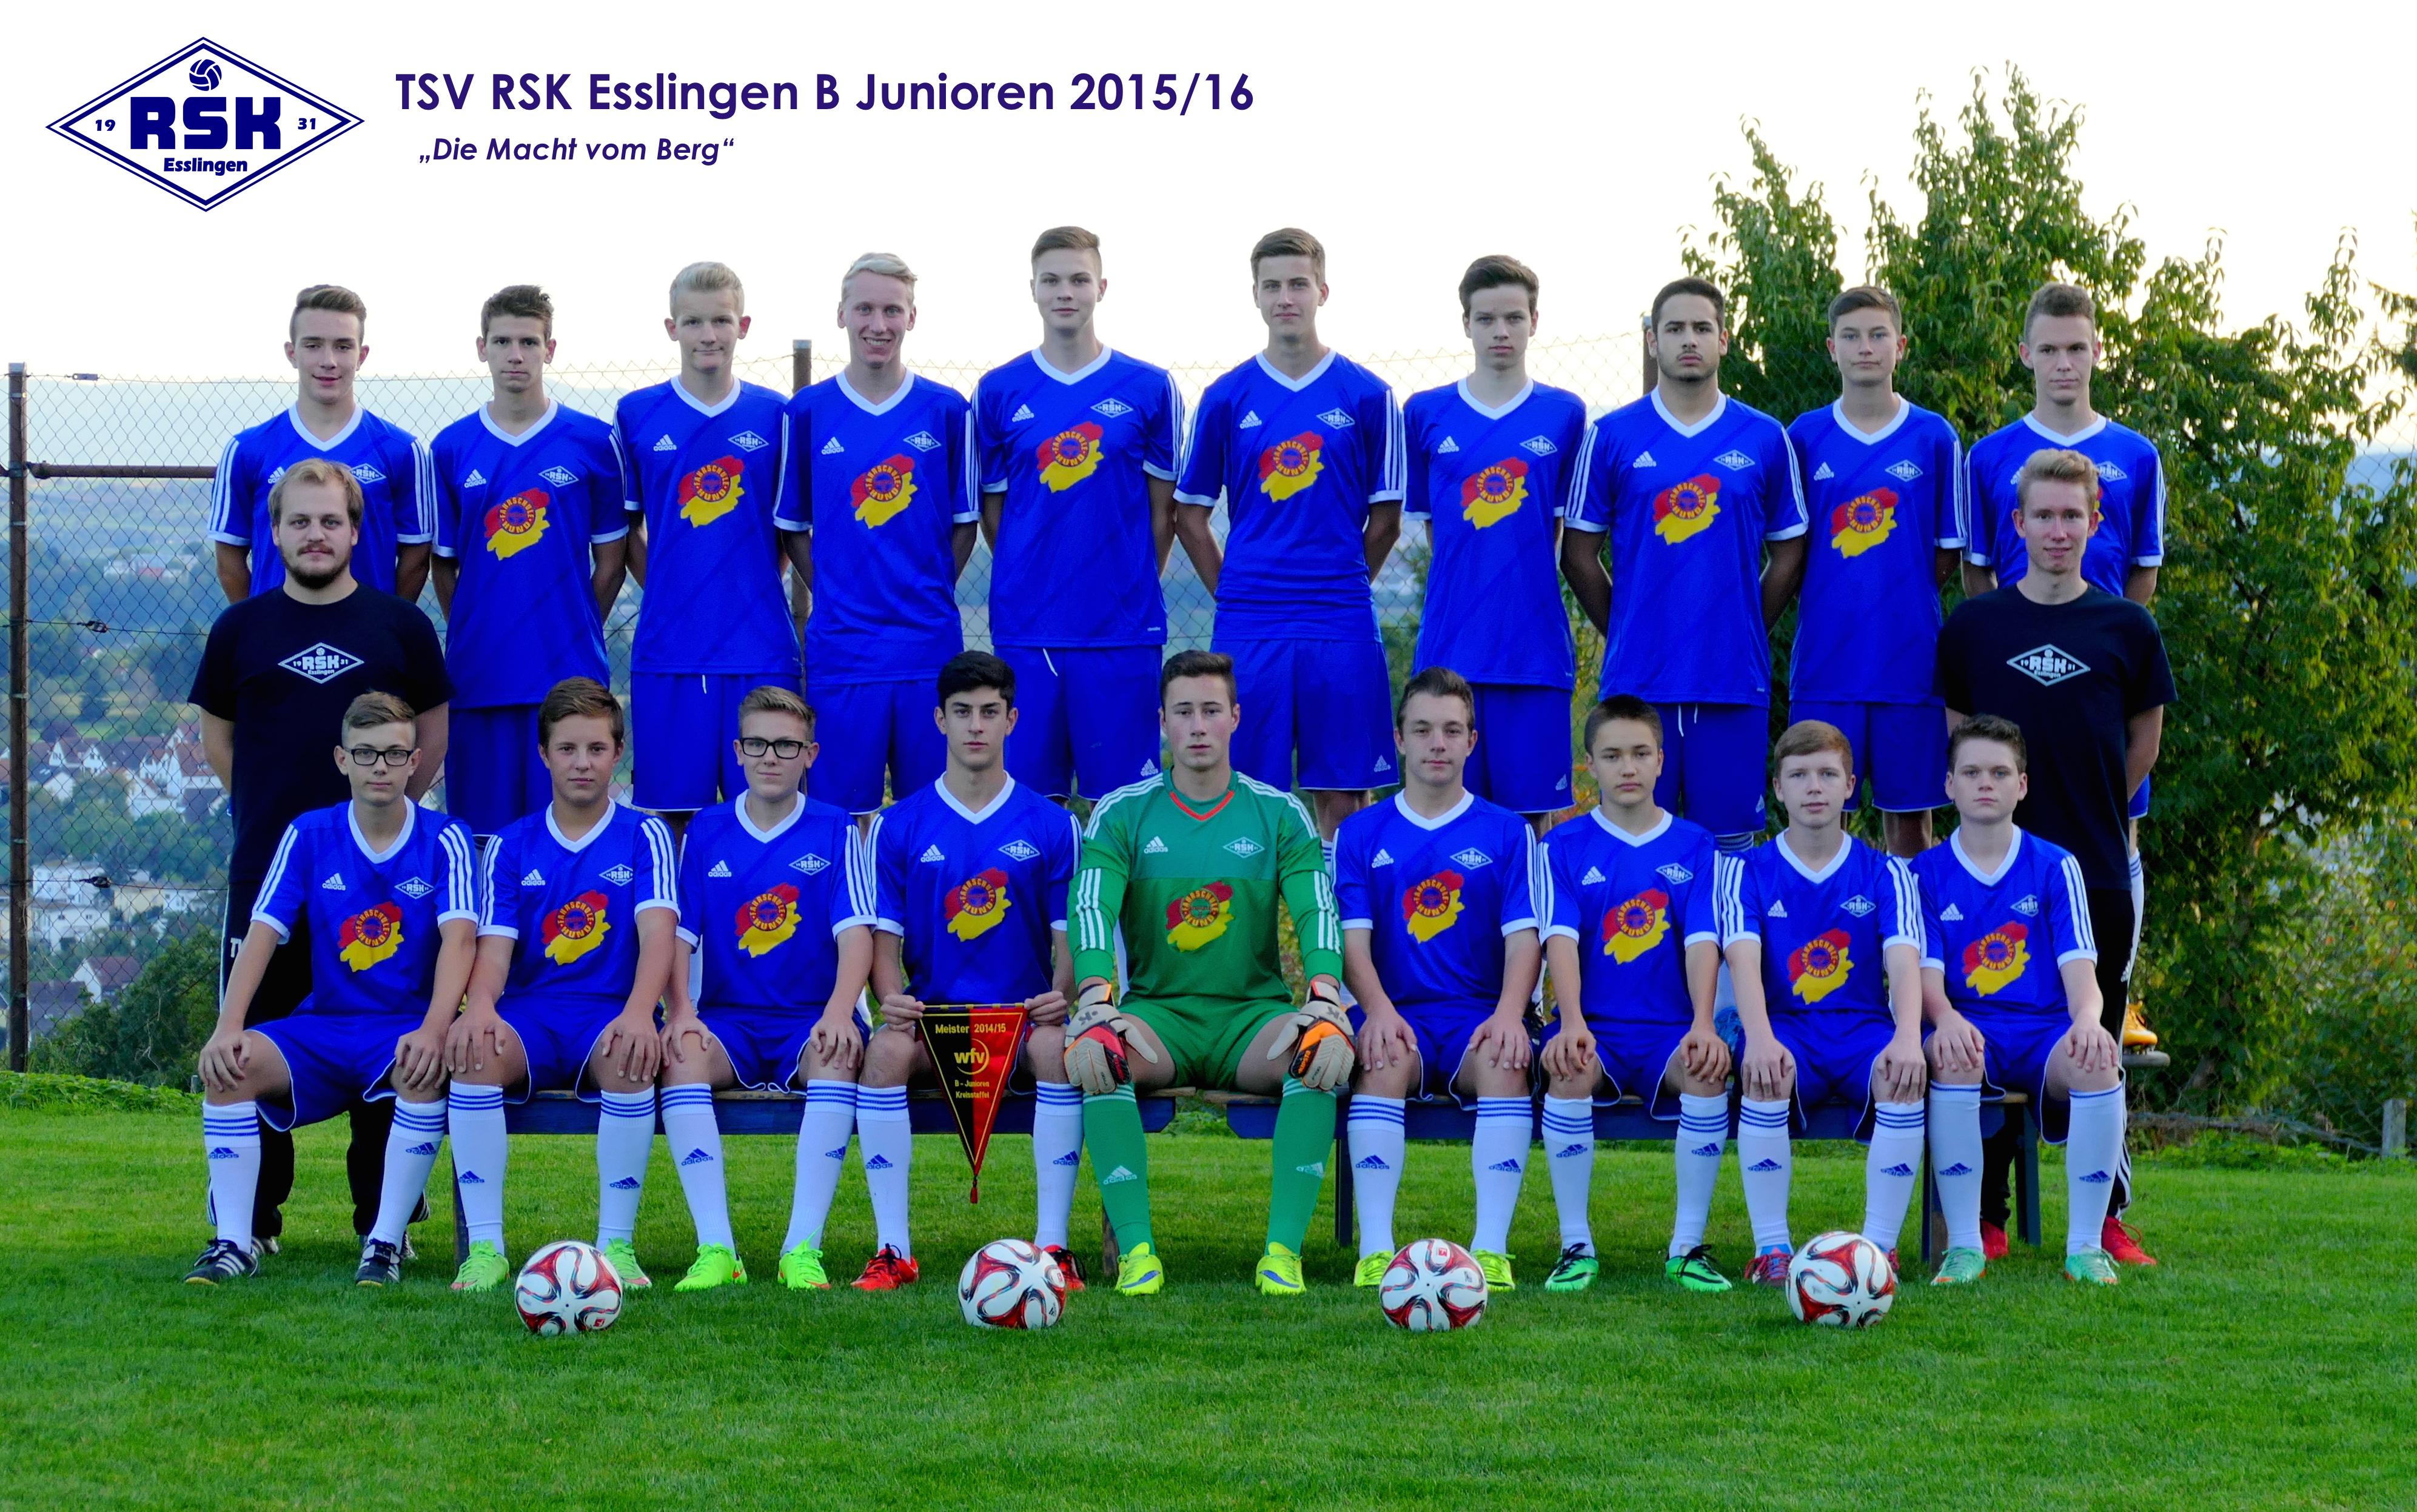 B Junioren 2015-16